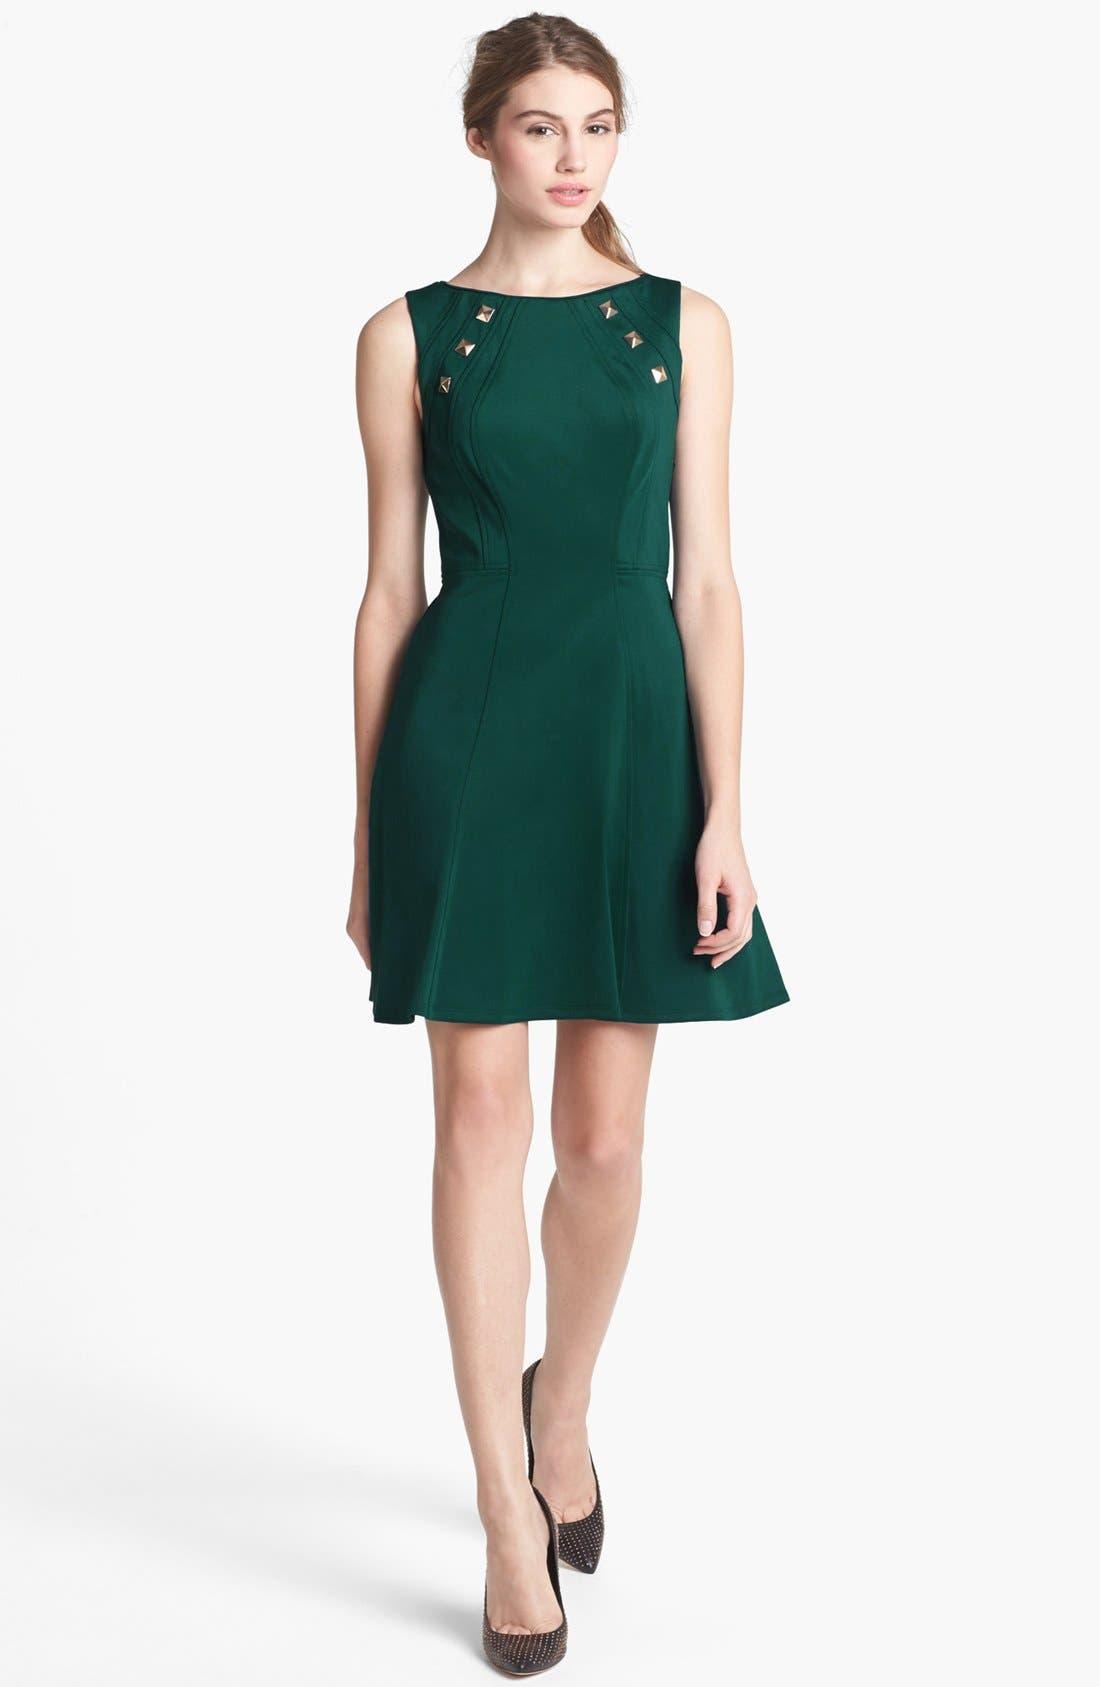 Main Image - Vince Camuto Studded Scuba Knit Fit & Flare Dress